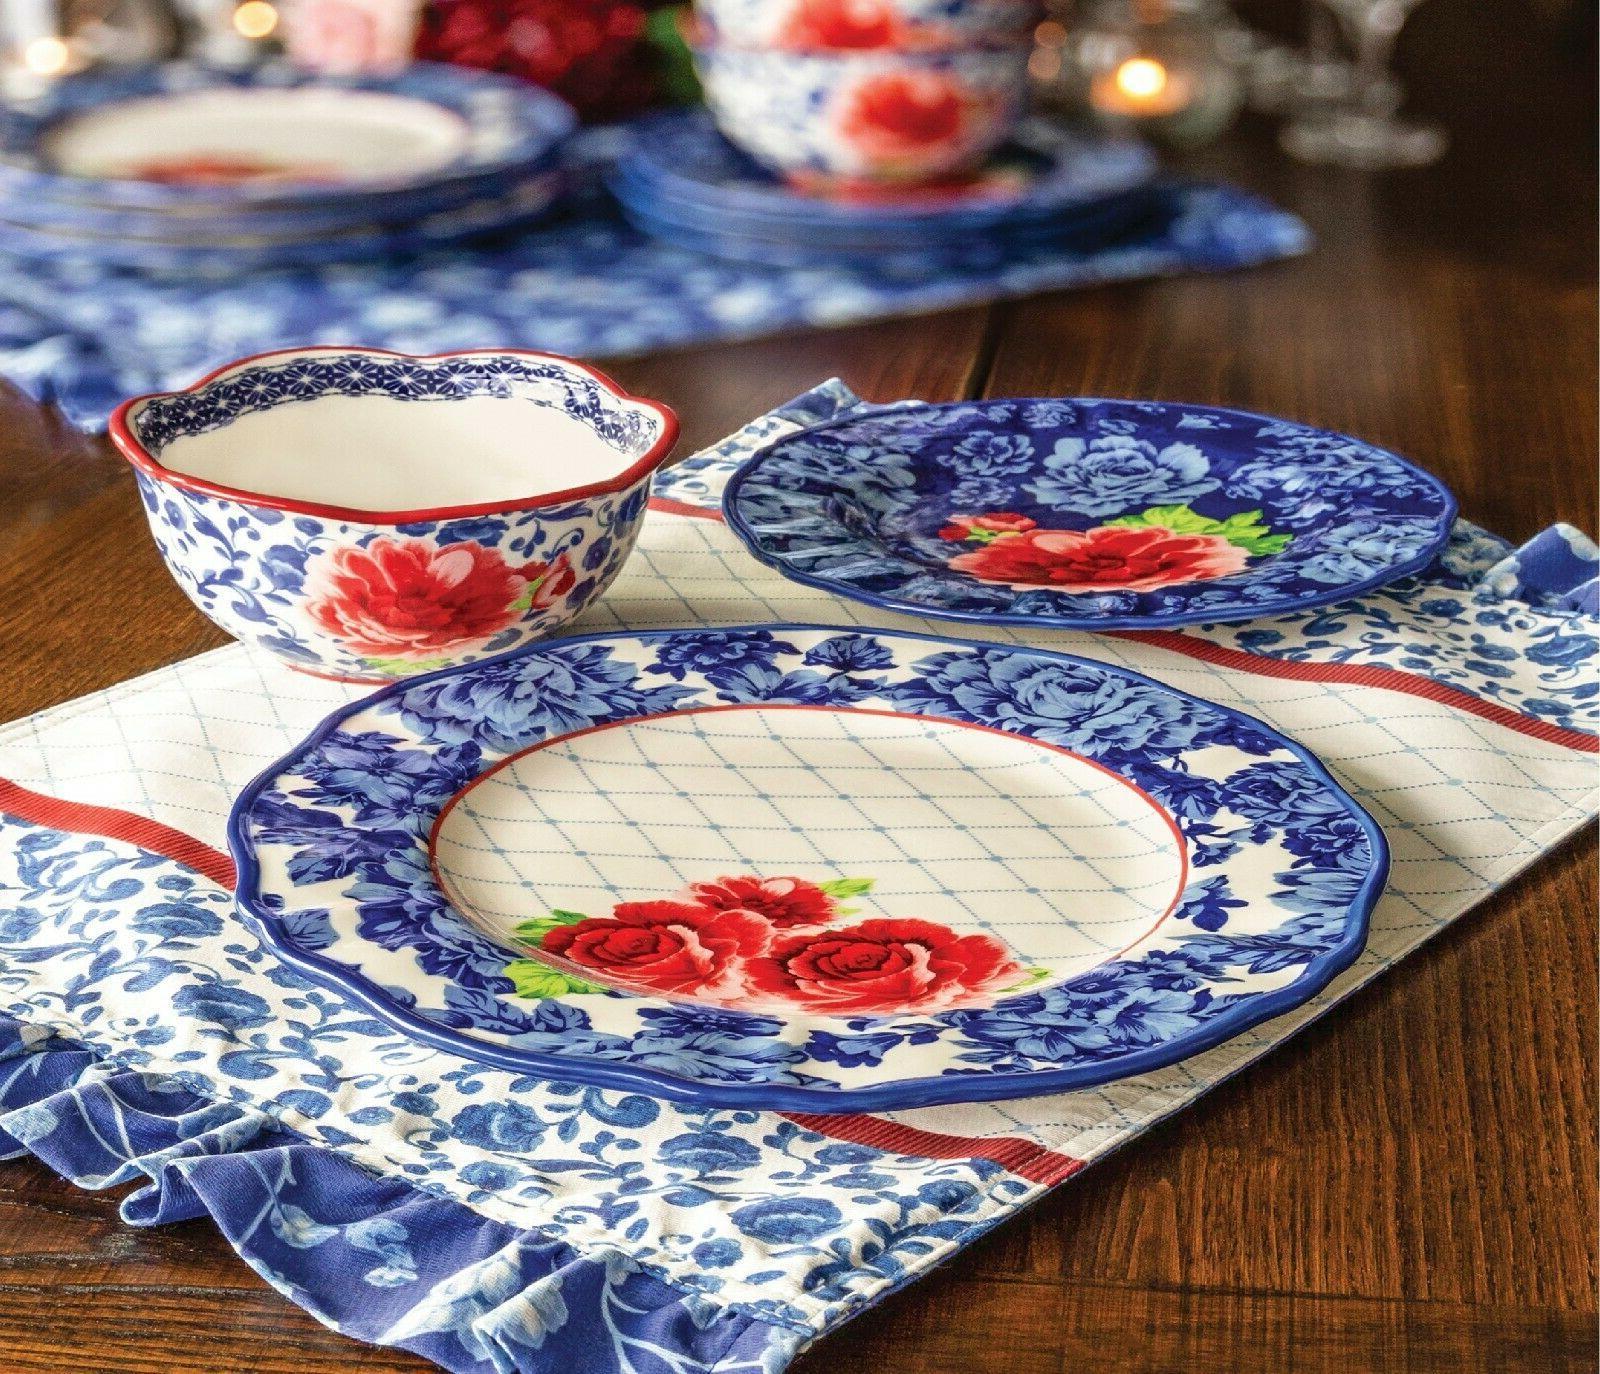 The Pioneer Floral 12-Piece Dinnerware Blue Dishwasher Safe